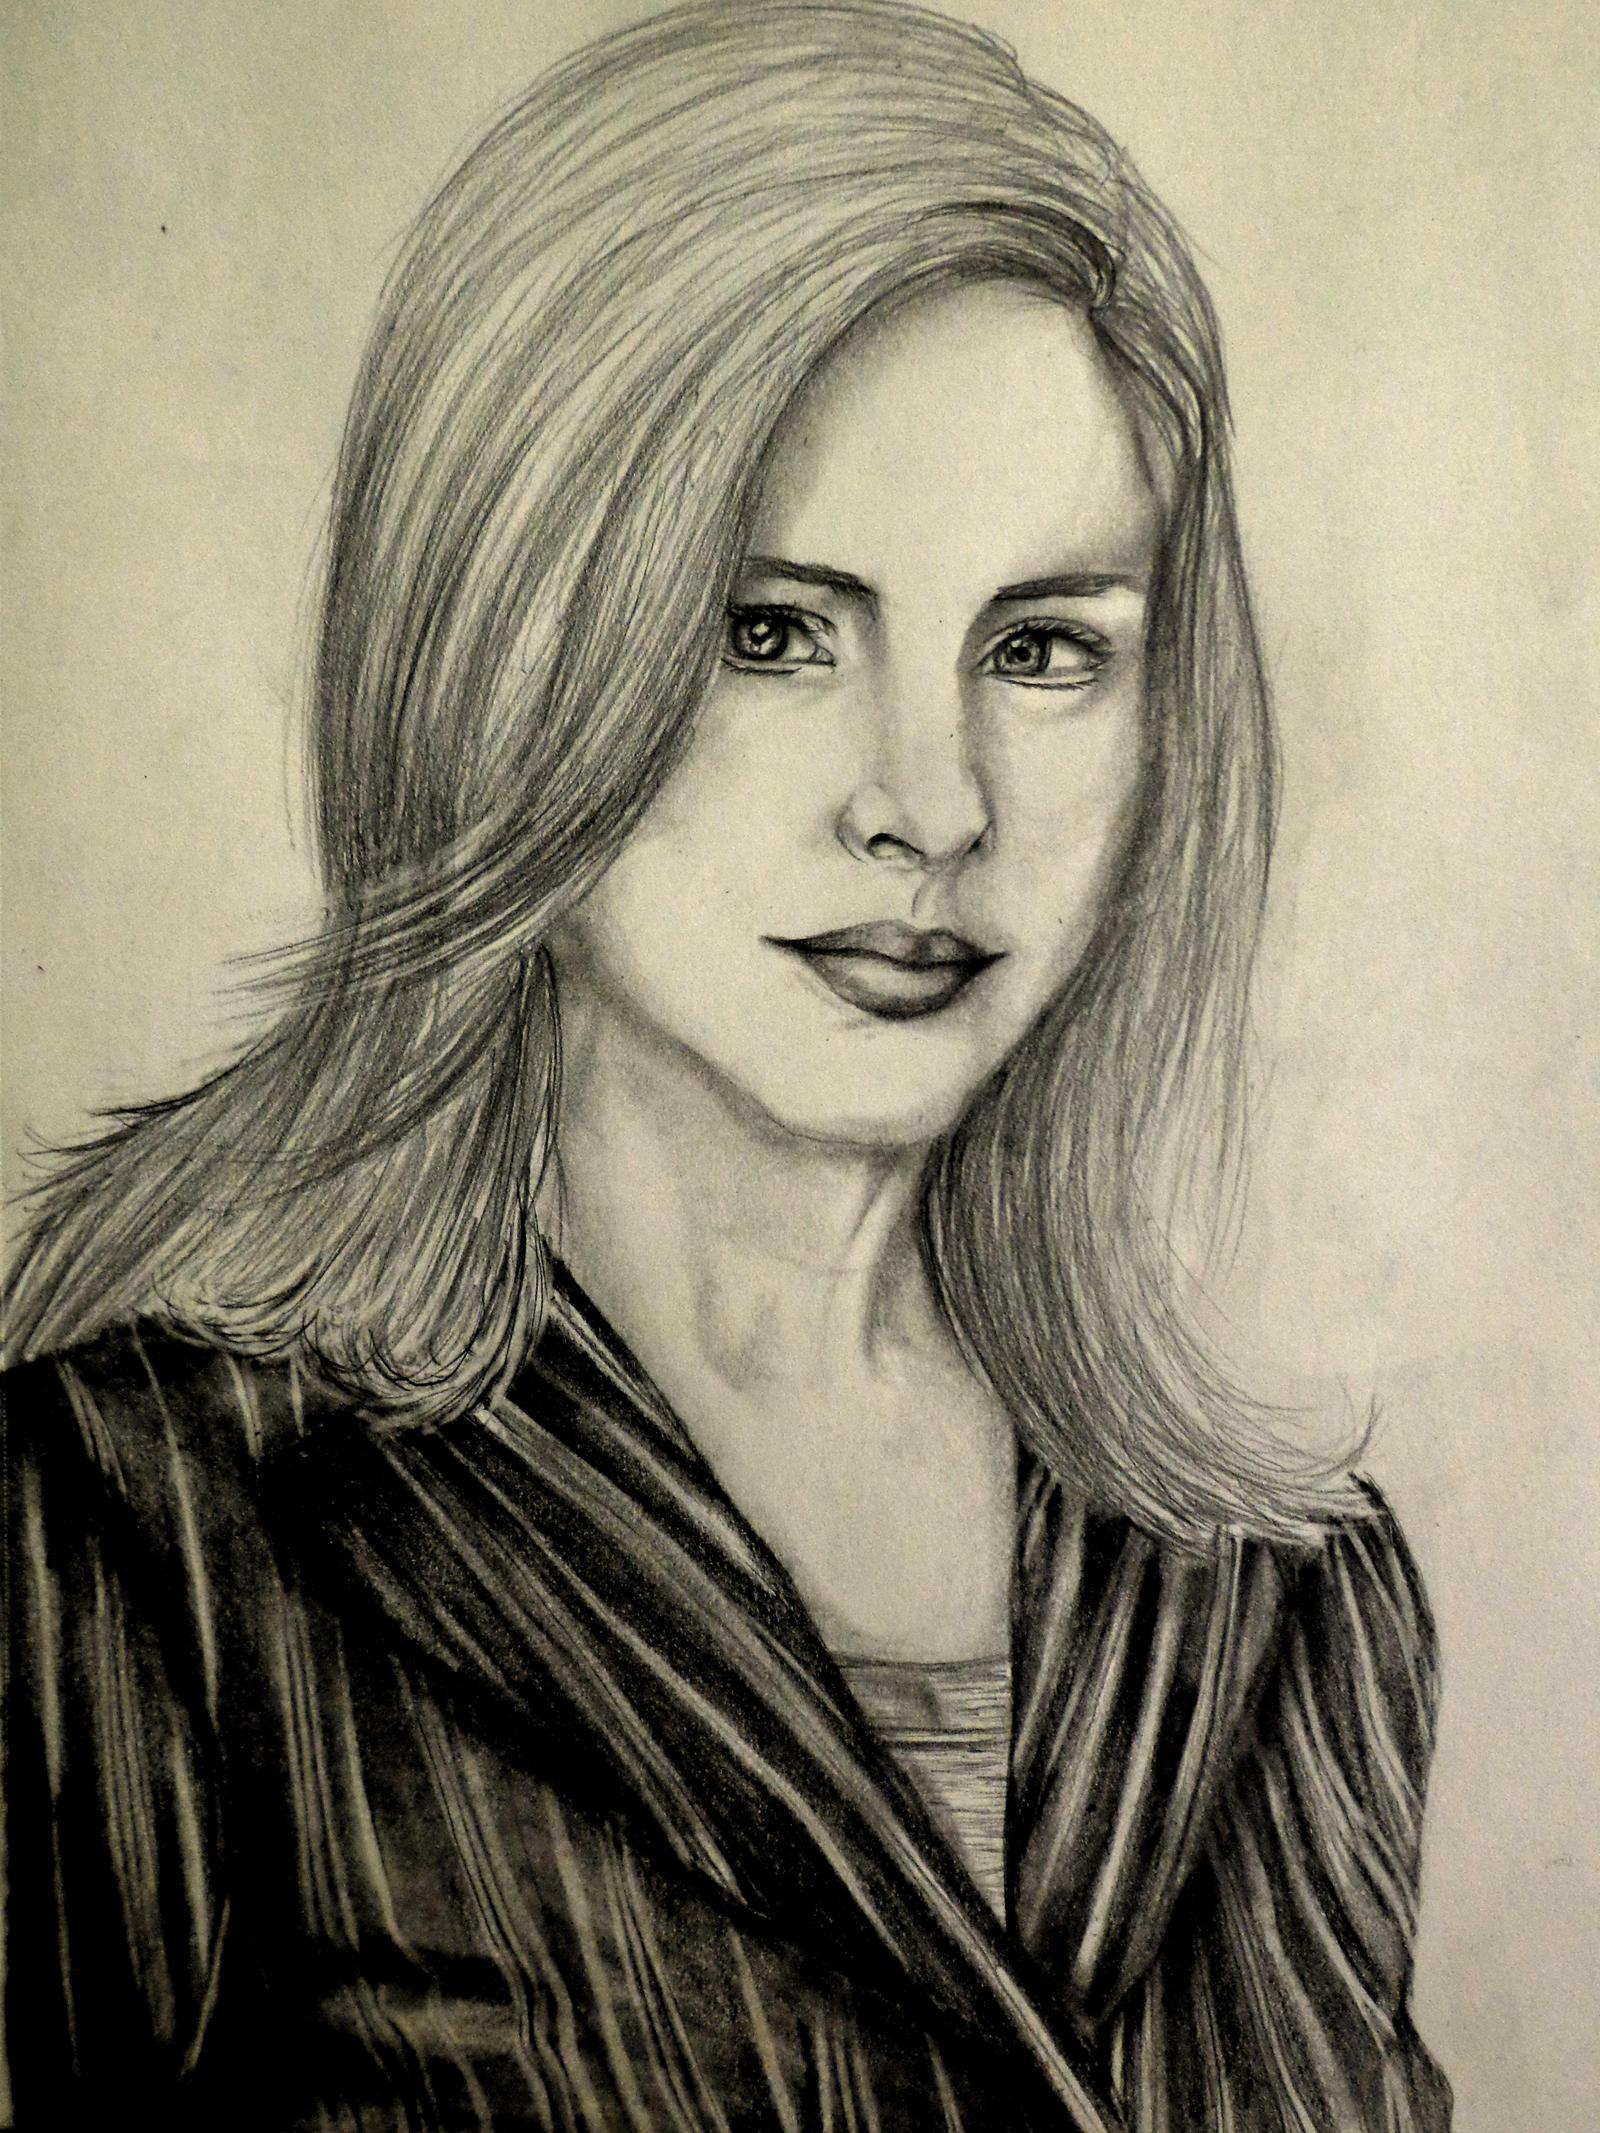 Diane Neal 013 wallpaper - Diane Neal - Celebrities | Girls ...